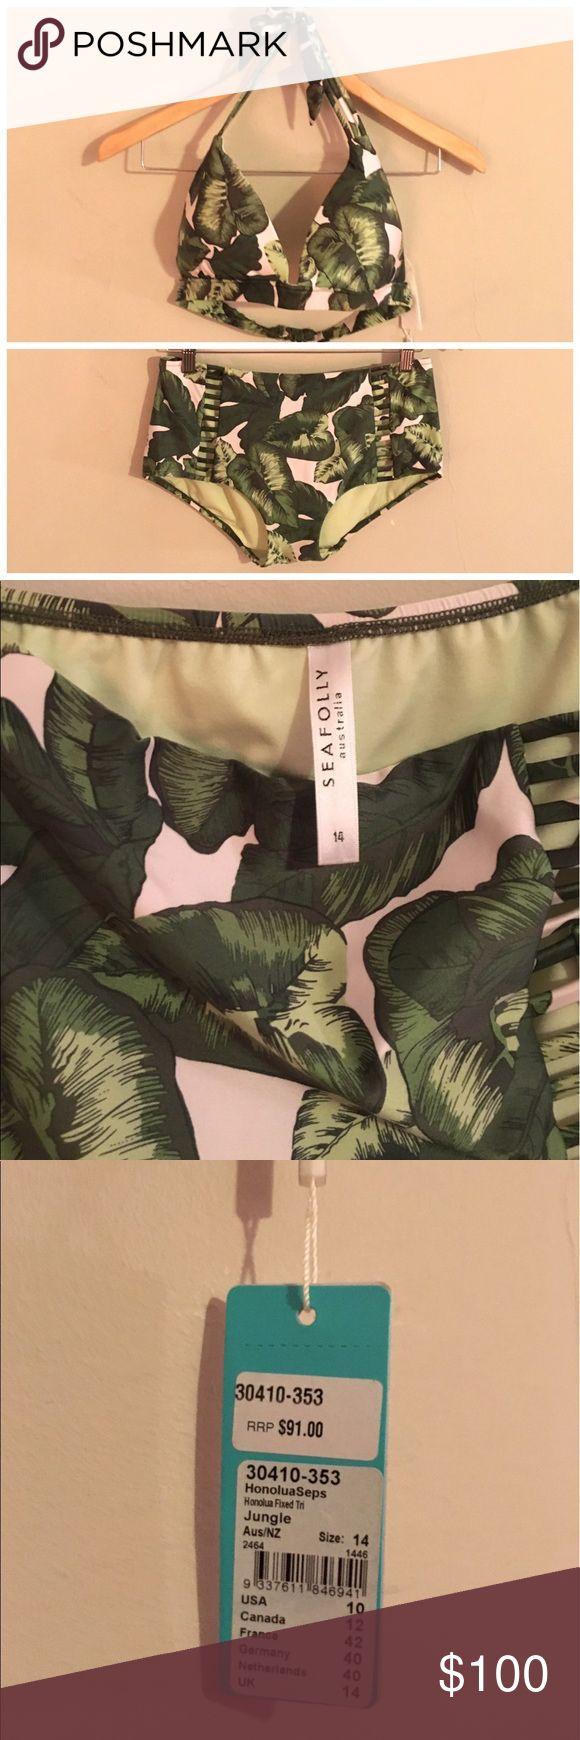 NWT Seafolly Honolula Bikini Brand new with tags Seafolly Honolulu tropical leaf print triangle bikini top and matching Cutout high waist bikini bottoms both size 14 Anthropologie Swim Bikinis